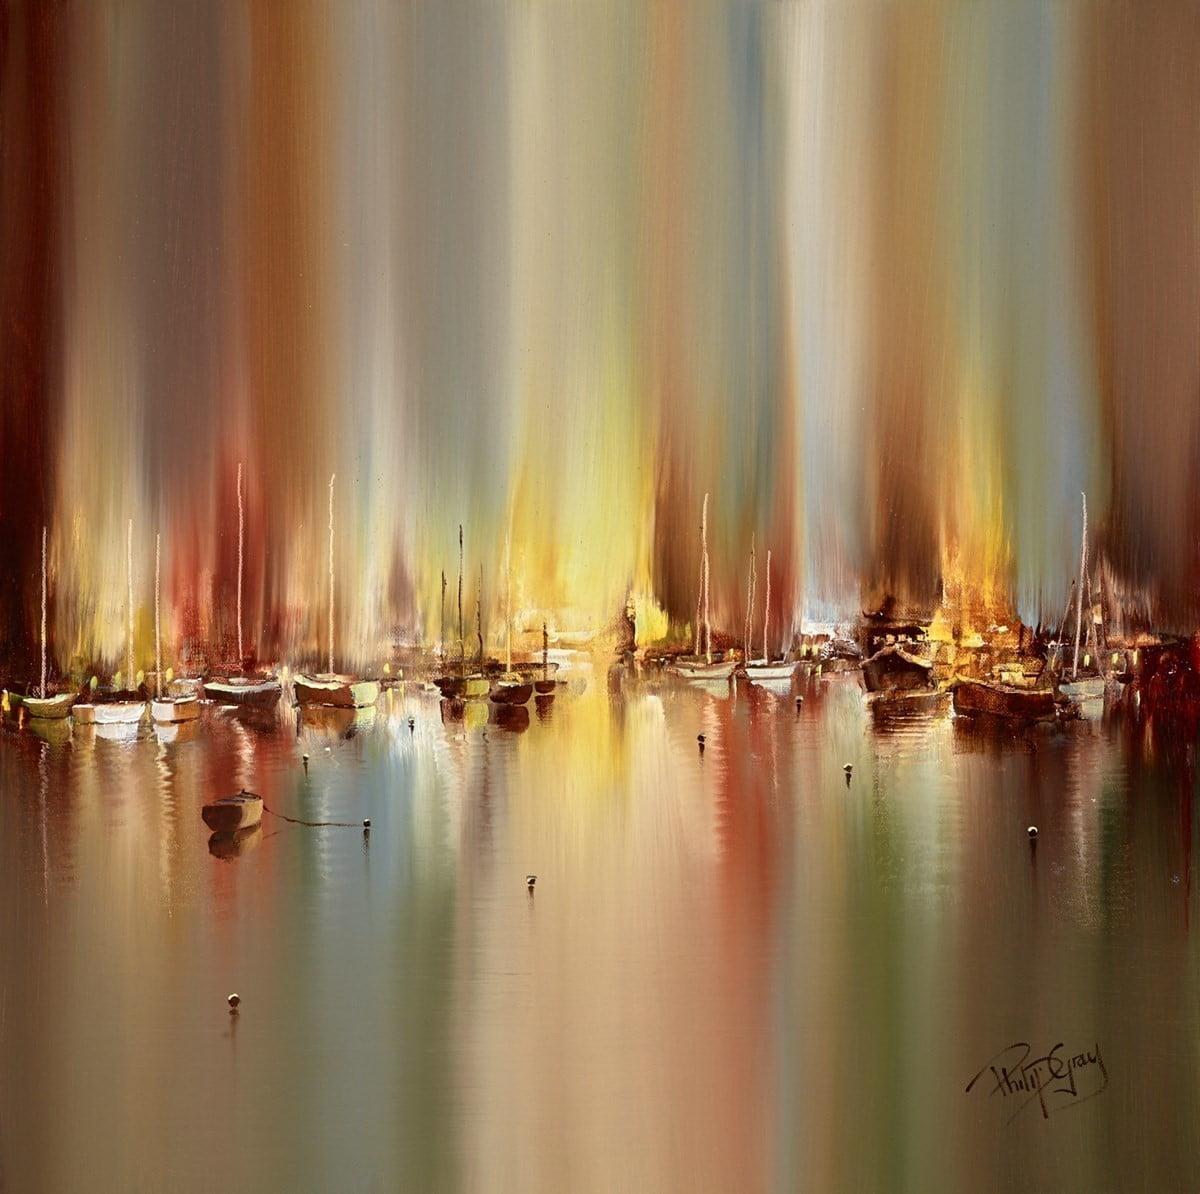 Harbour Hush I ~ Philip Gray